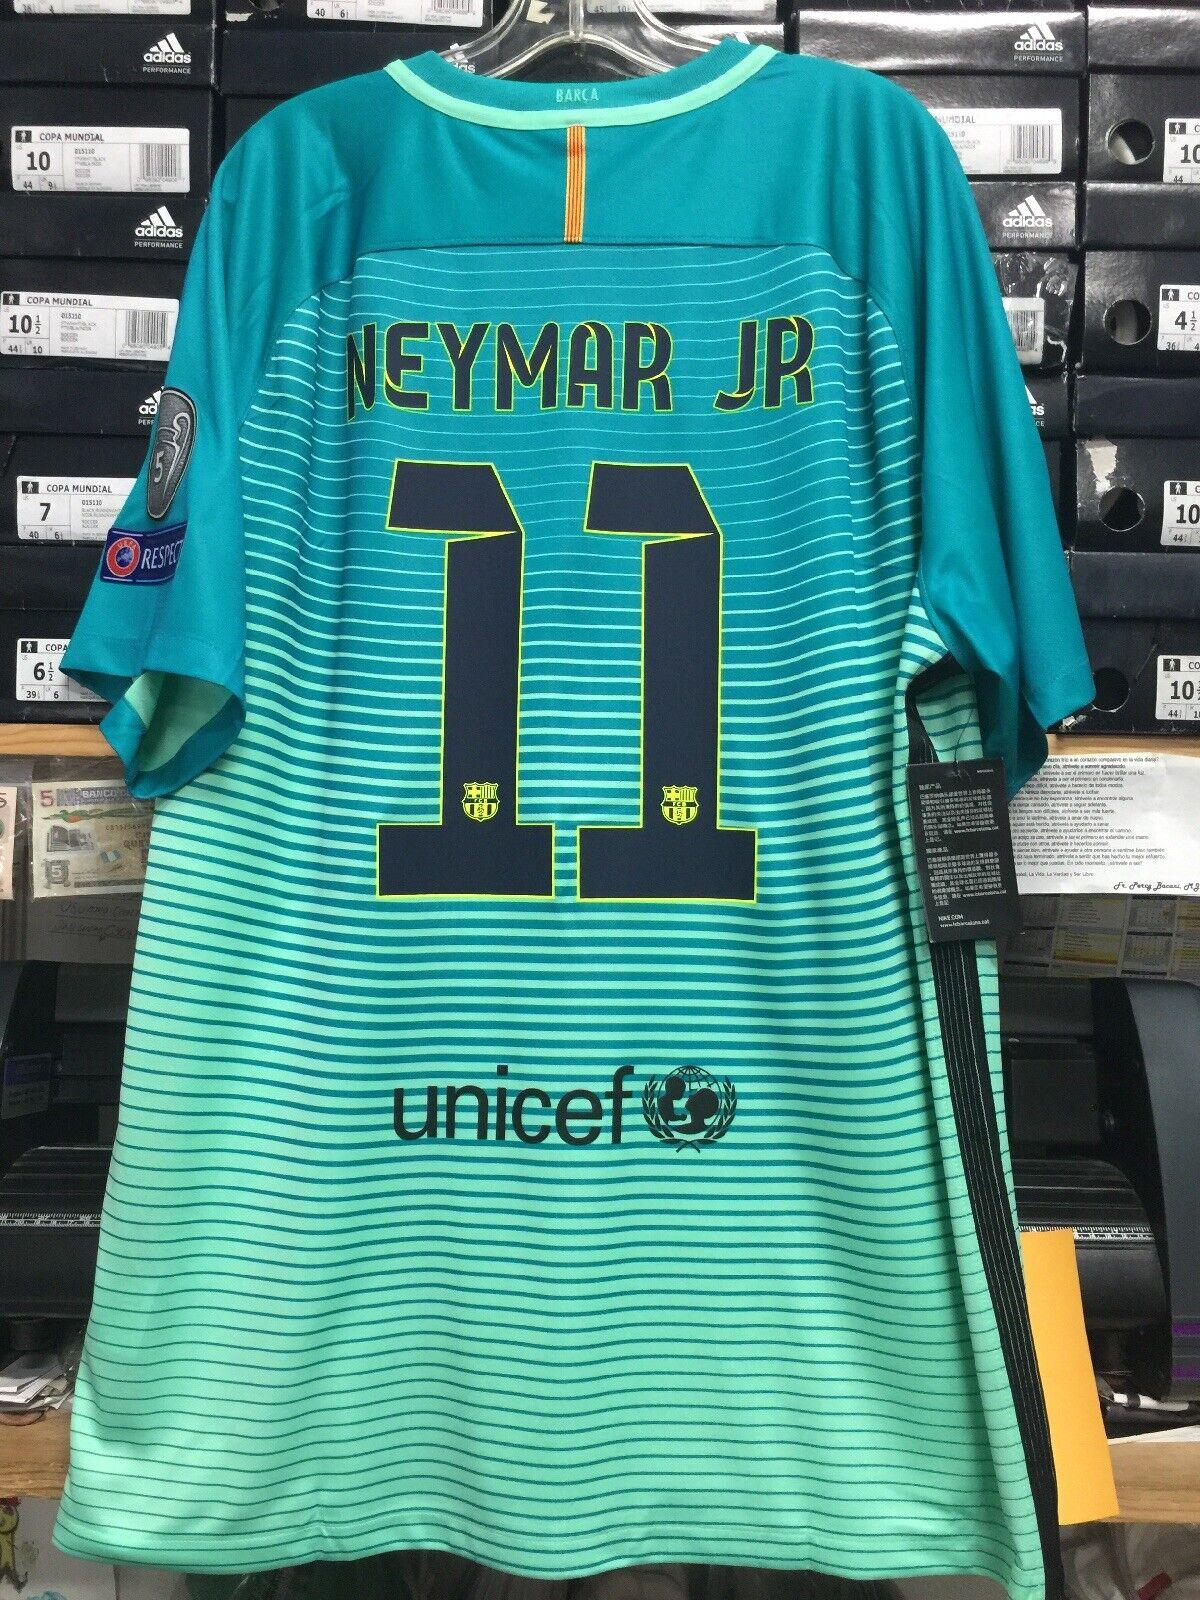 Nike Fc Barcelona Third Jersey 16 17 Mint Green Neymar Jr 11 Size Xxl Only For Sale Online